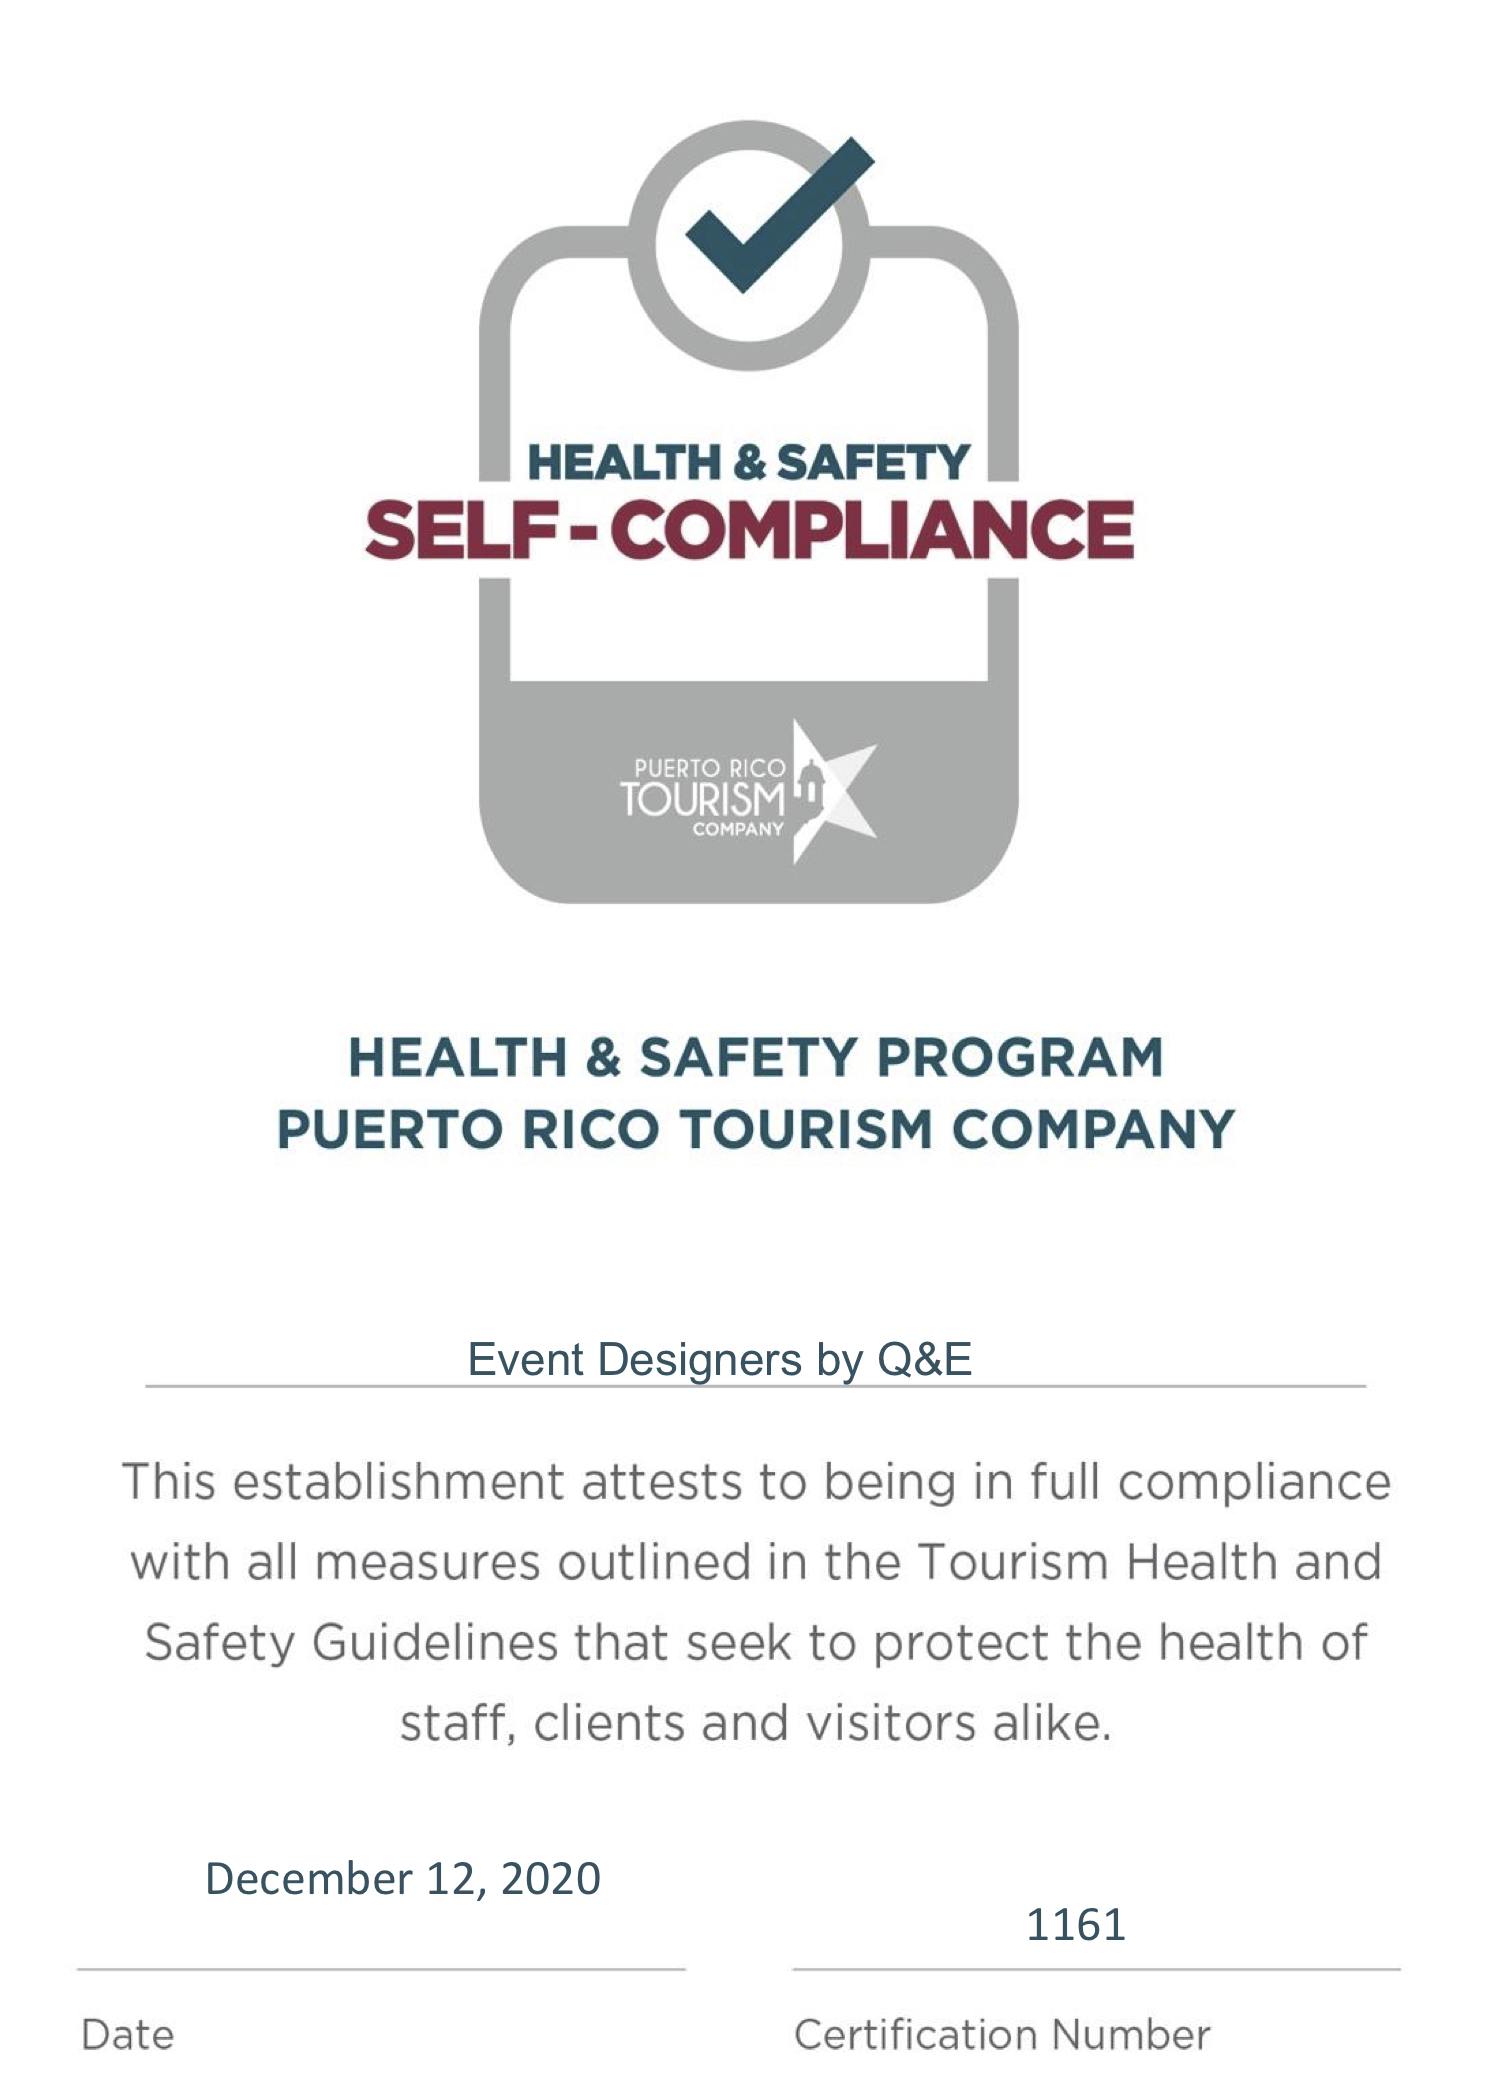 Auto Certificate - Health Safety Program - Puerto RIco Tourism Company